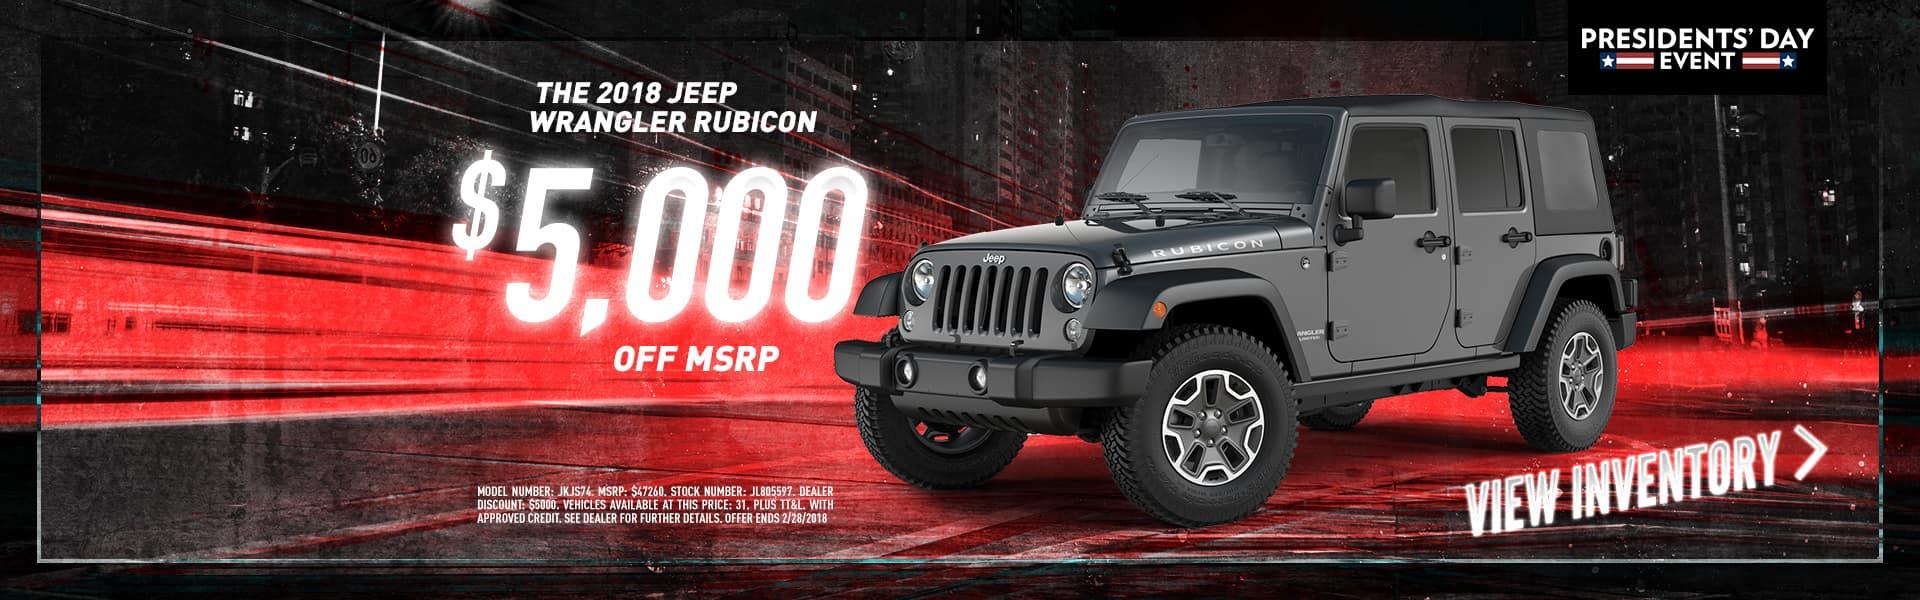 2018-jeep-wrangler-rubicon-rockwall